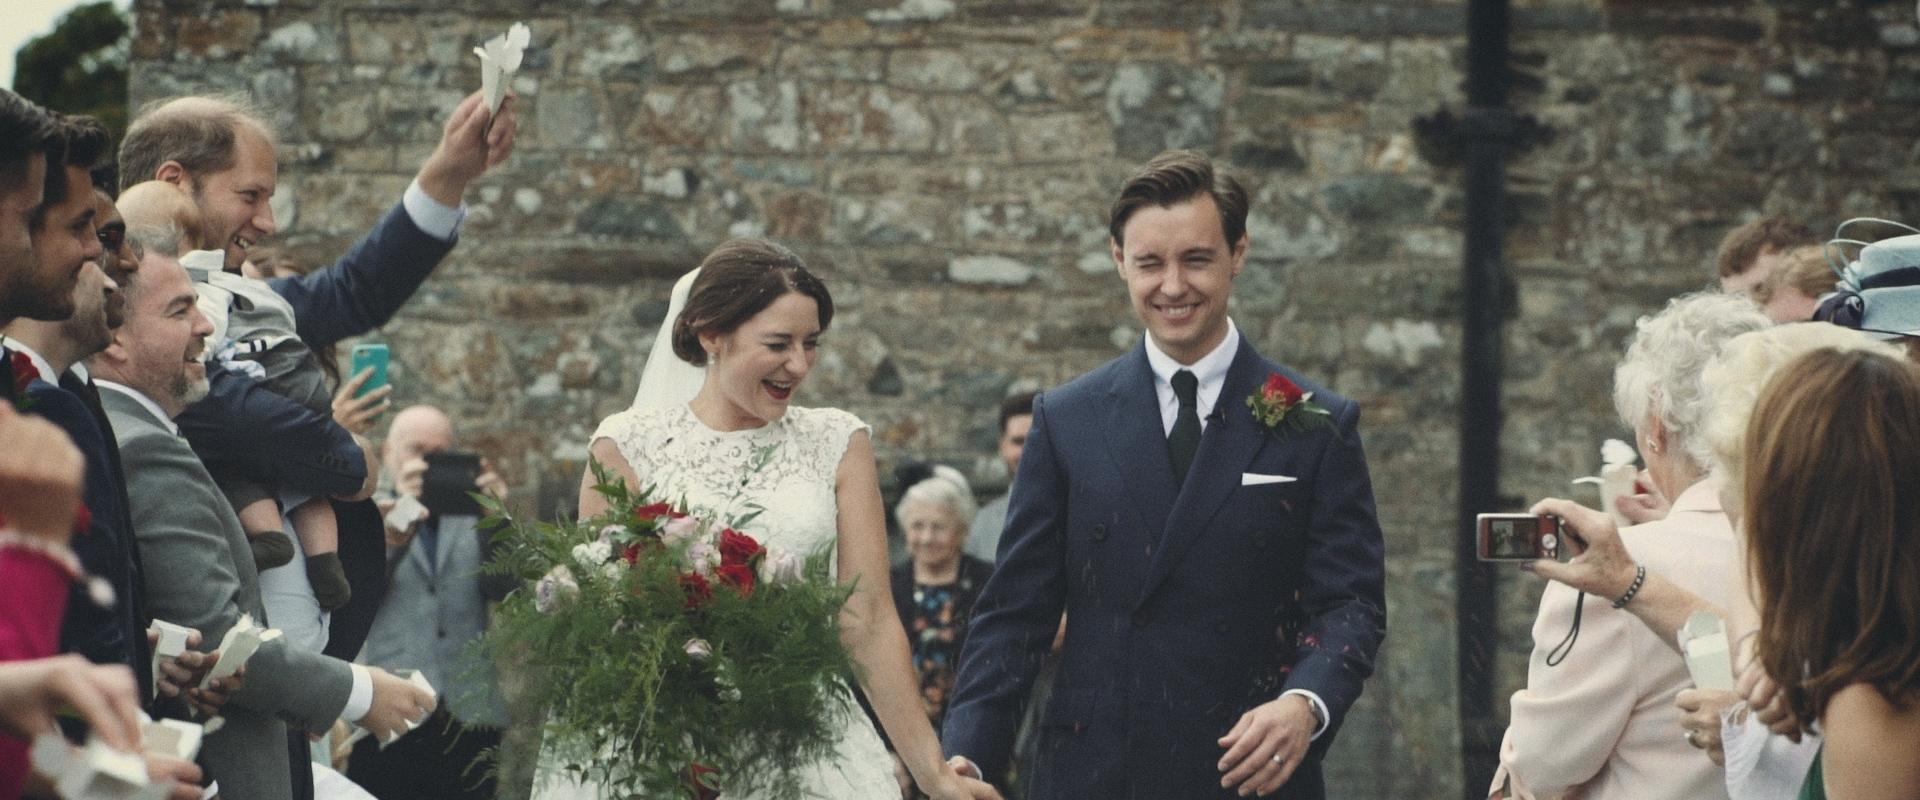 Wedding Videographer Wales